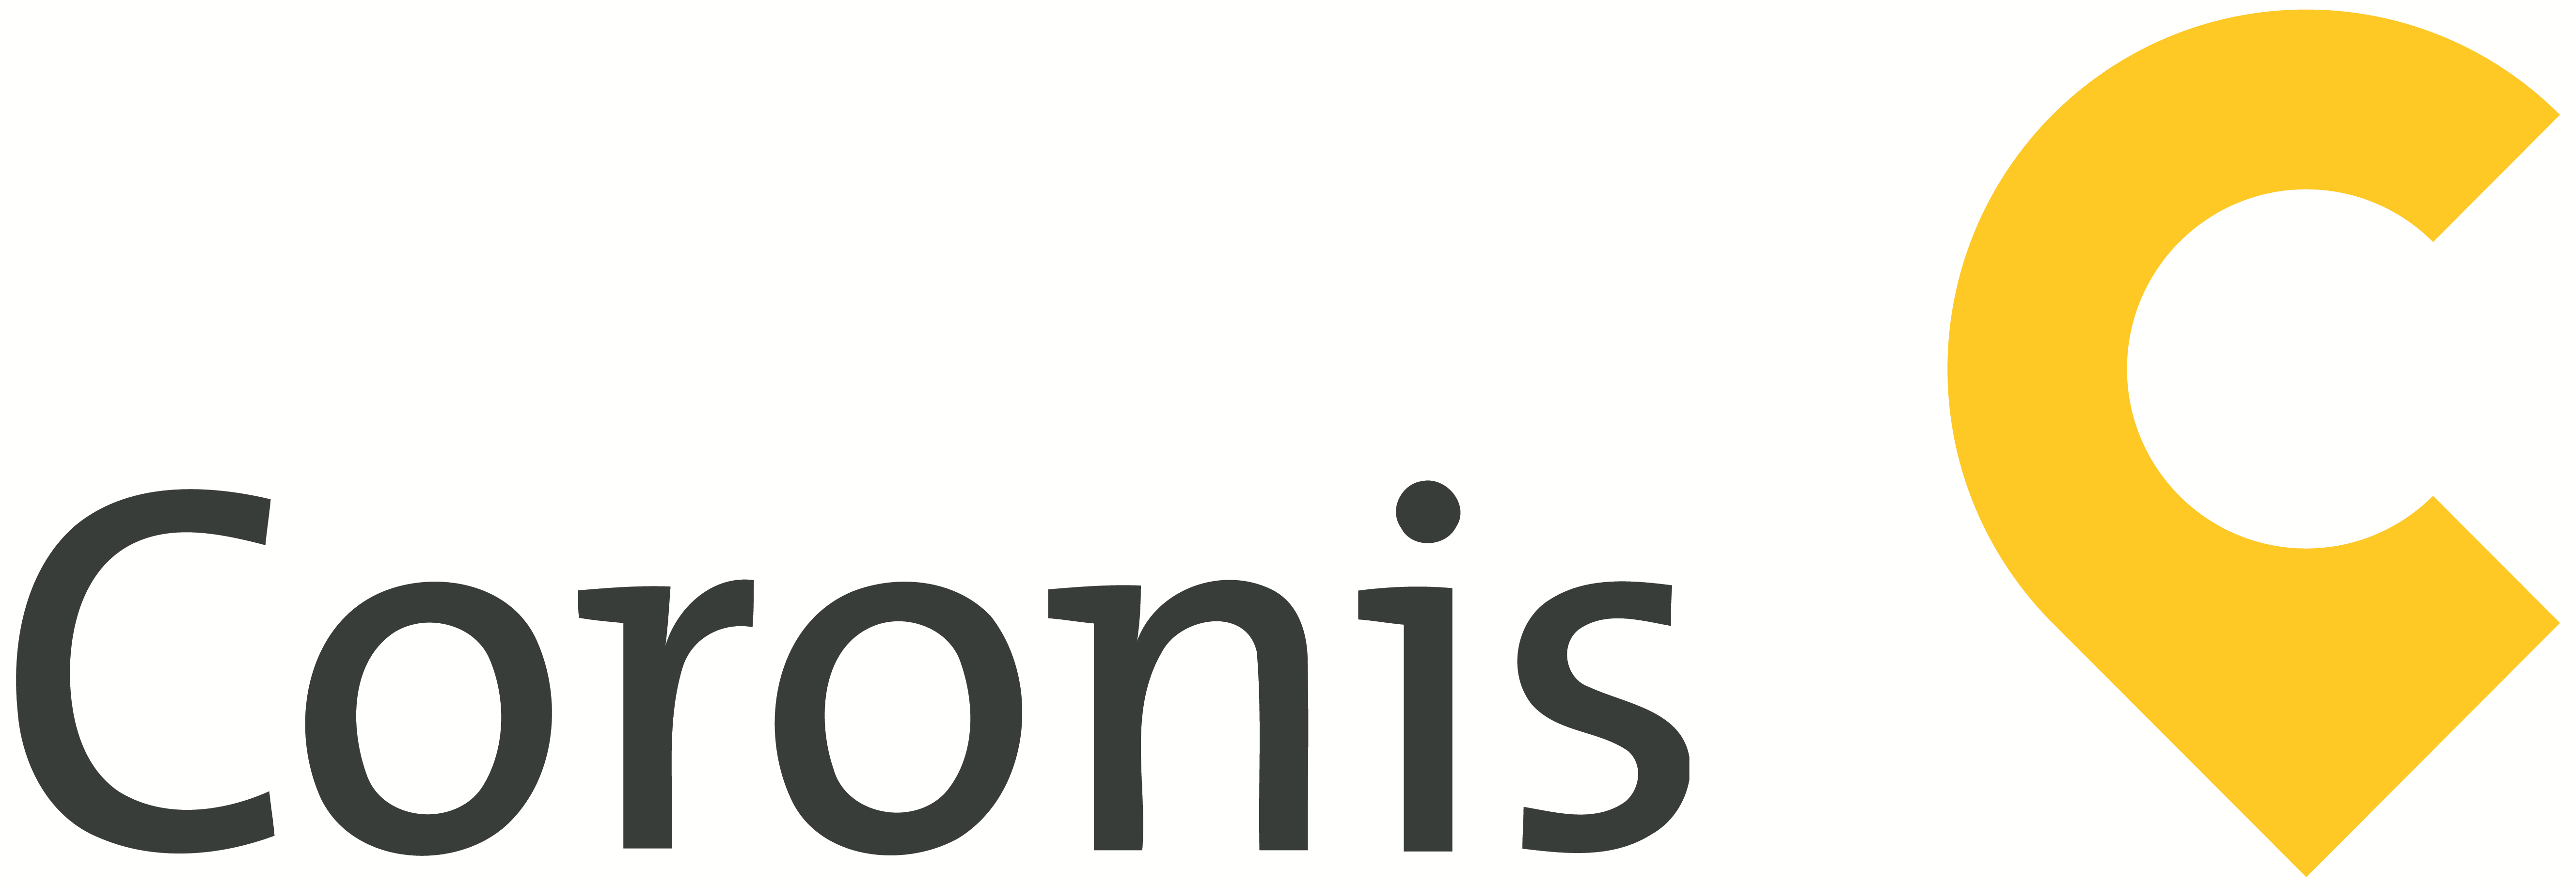 Coronis, Aspley, 4034